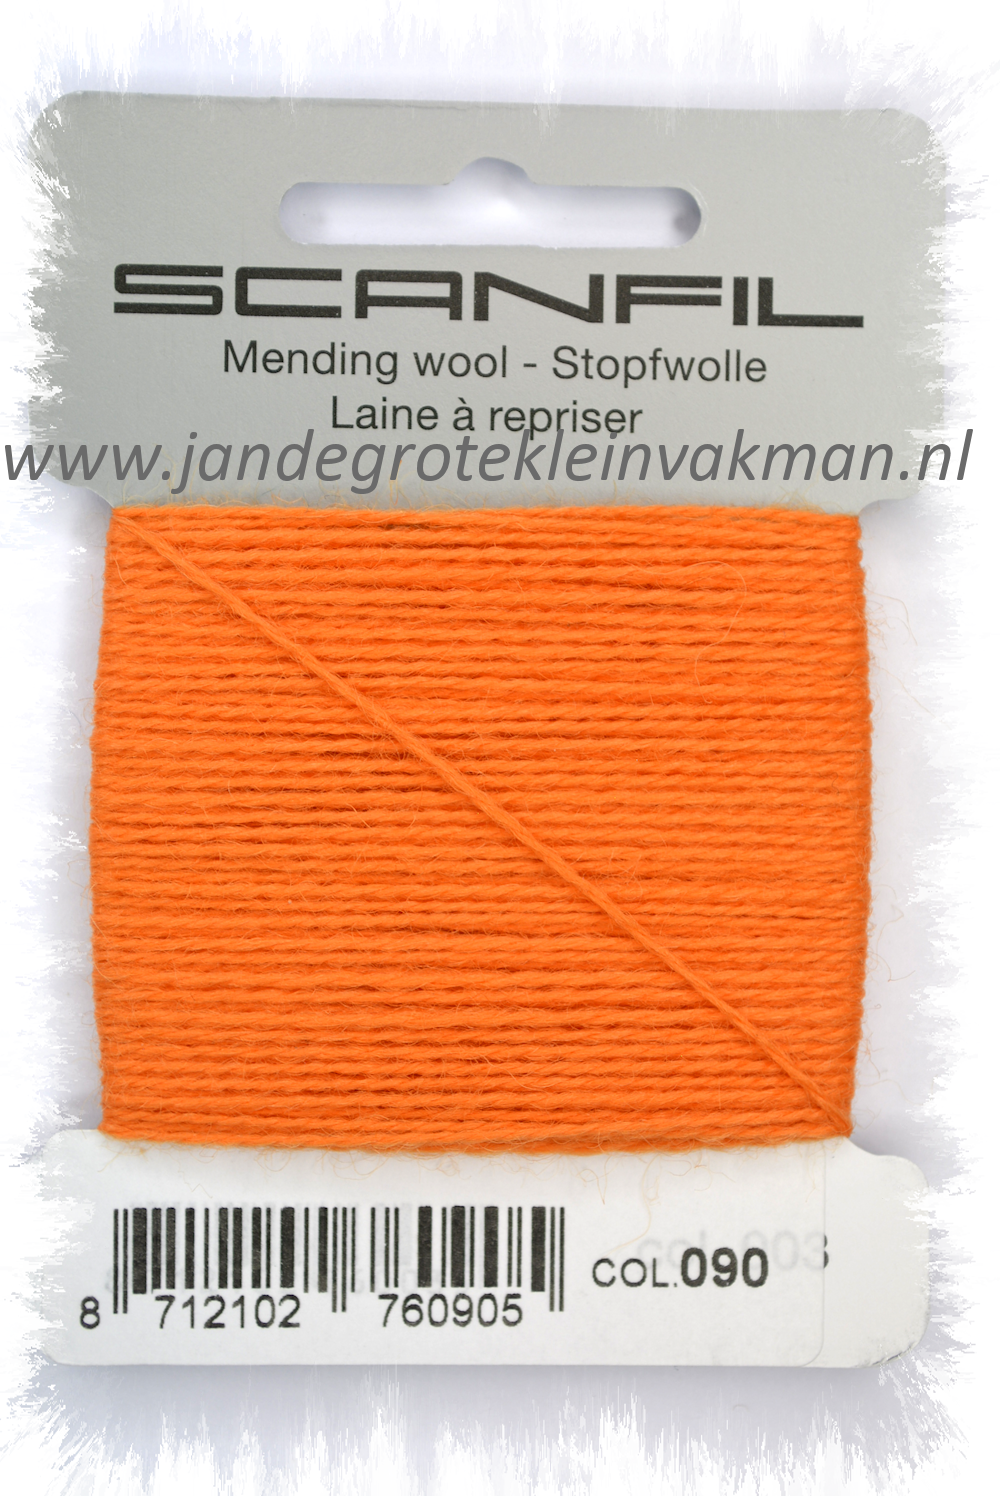 Stopwol, per kaartje van 15 meter, oranje